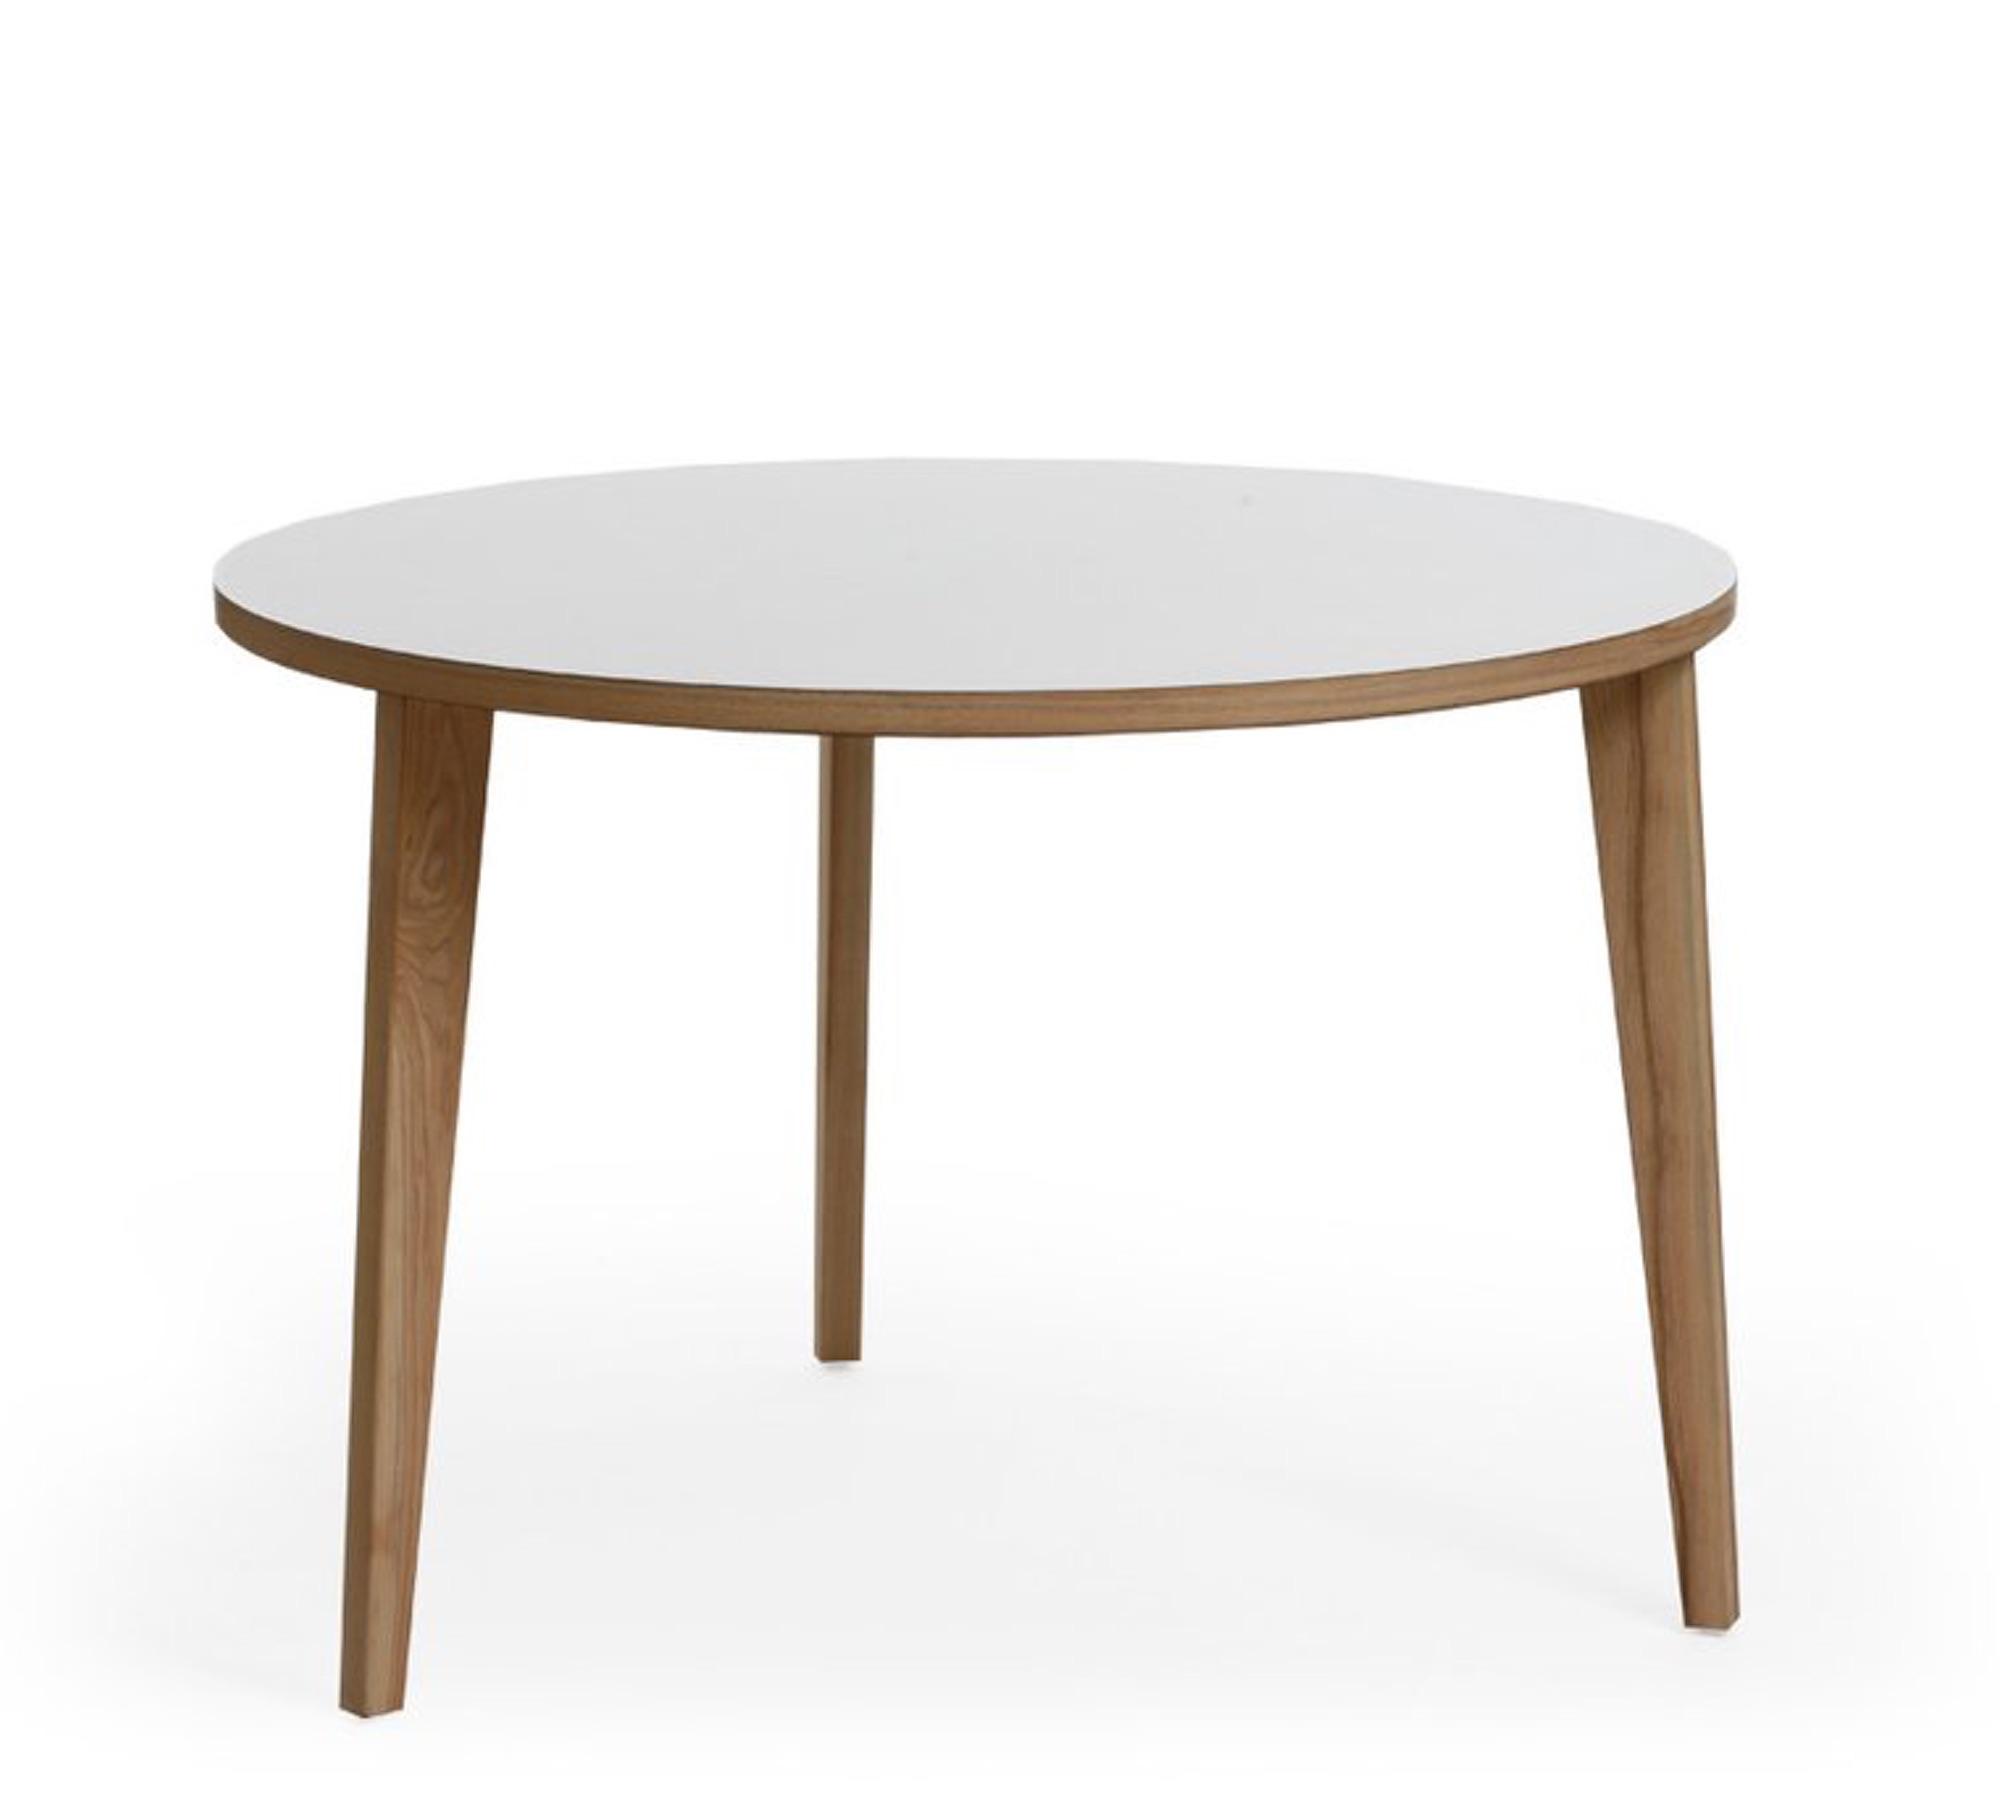 mint design tisch table aus massivholz d130 cm rund 10008455. Black Bedroom Furniture Sets. Home Design Ideas